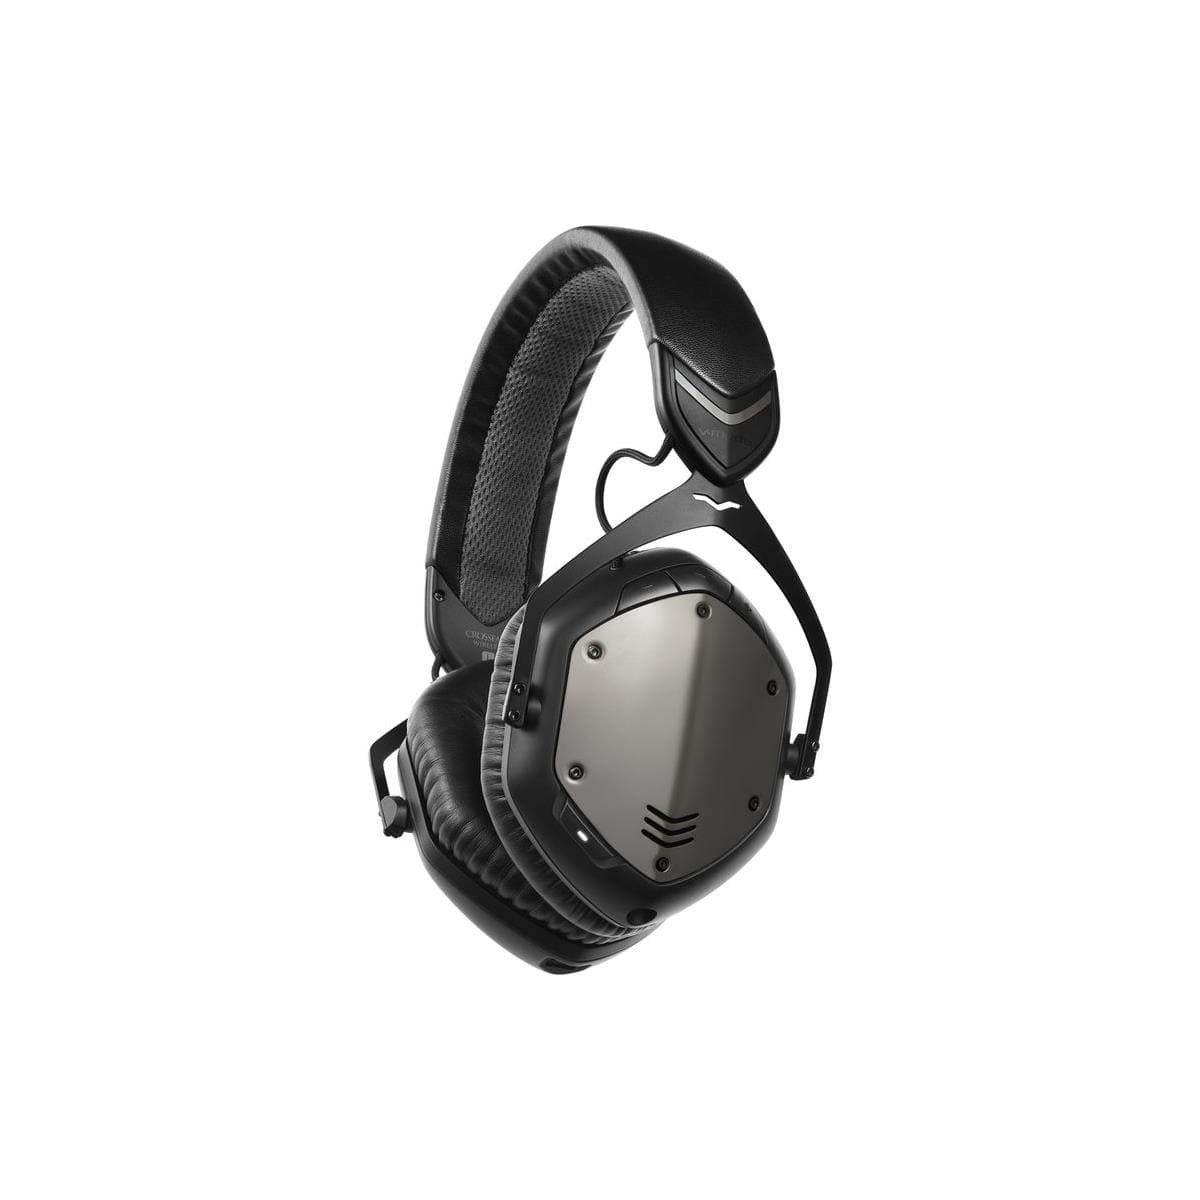 V-MODA Crossfade Over-Ear Wireless Bluetooth Headphones (Gunmetal)  $180 + Free Shipping